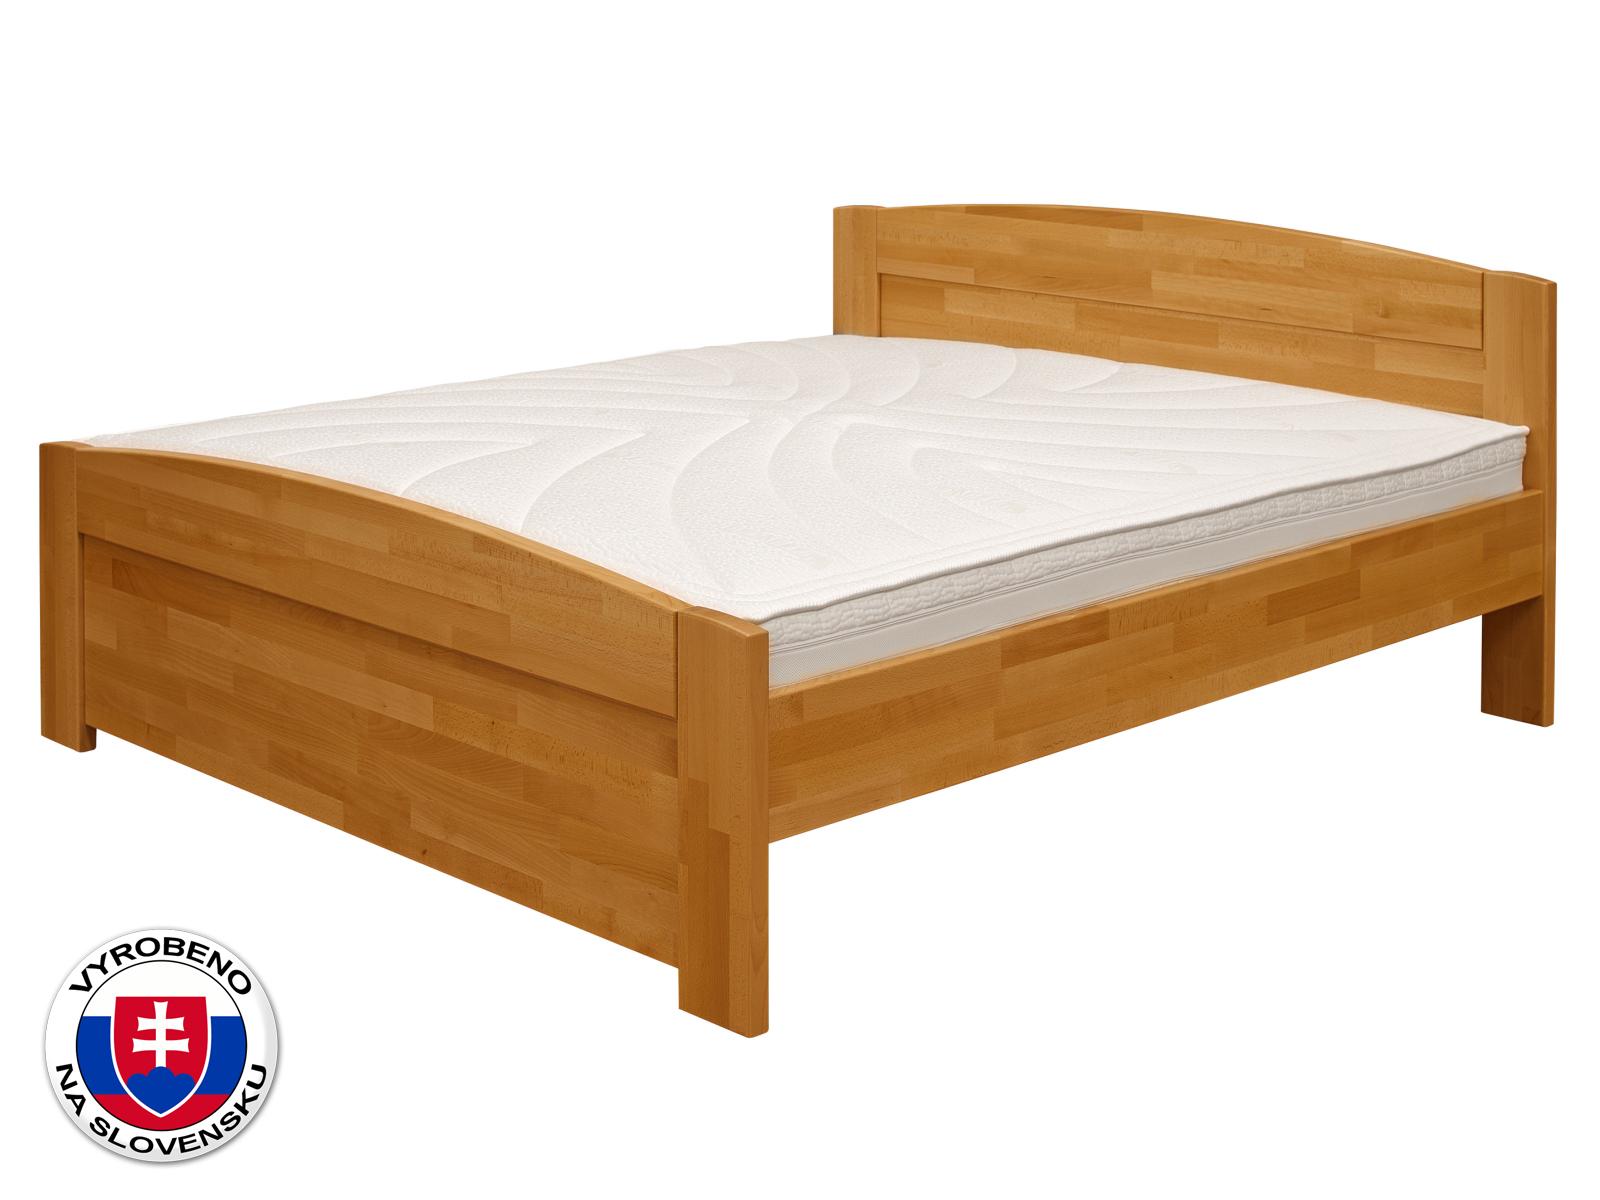 Manželská postel 180 cm - Purtex - Lada (masiv)